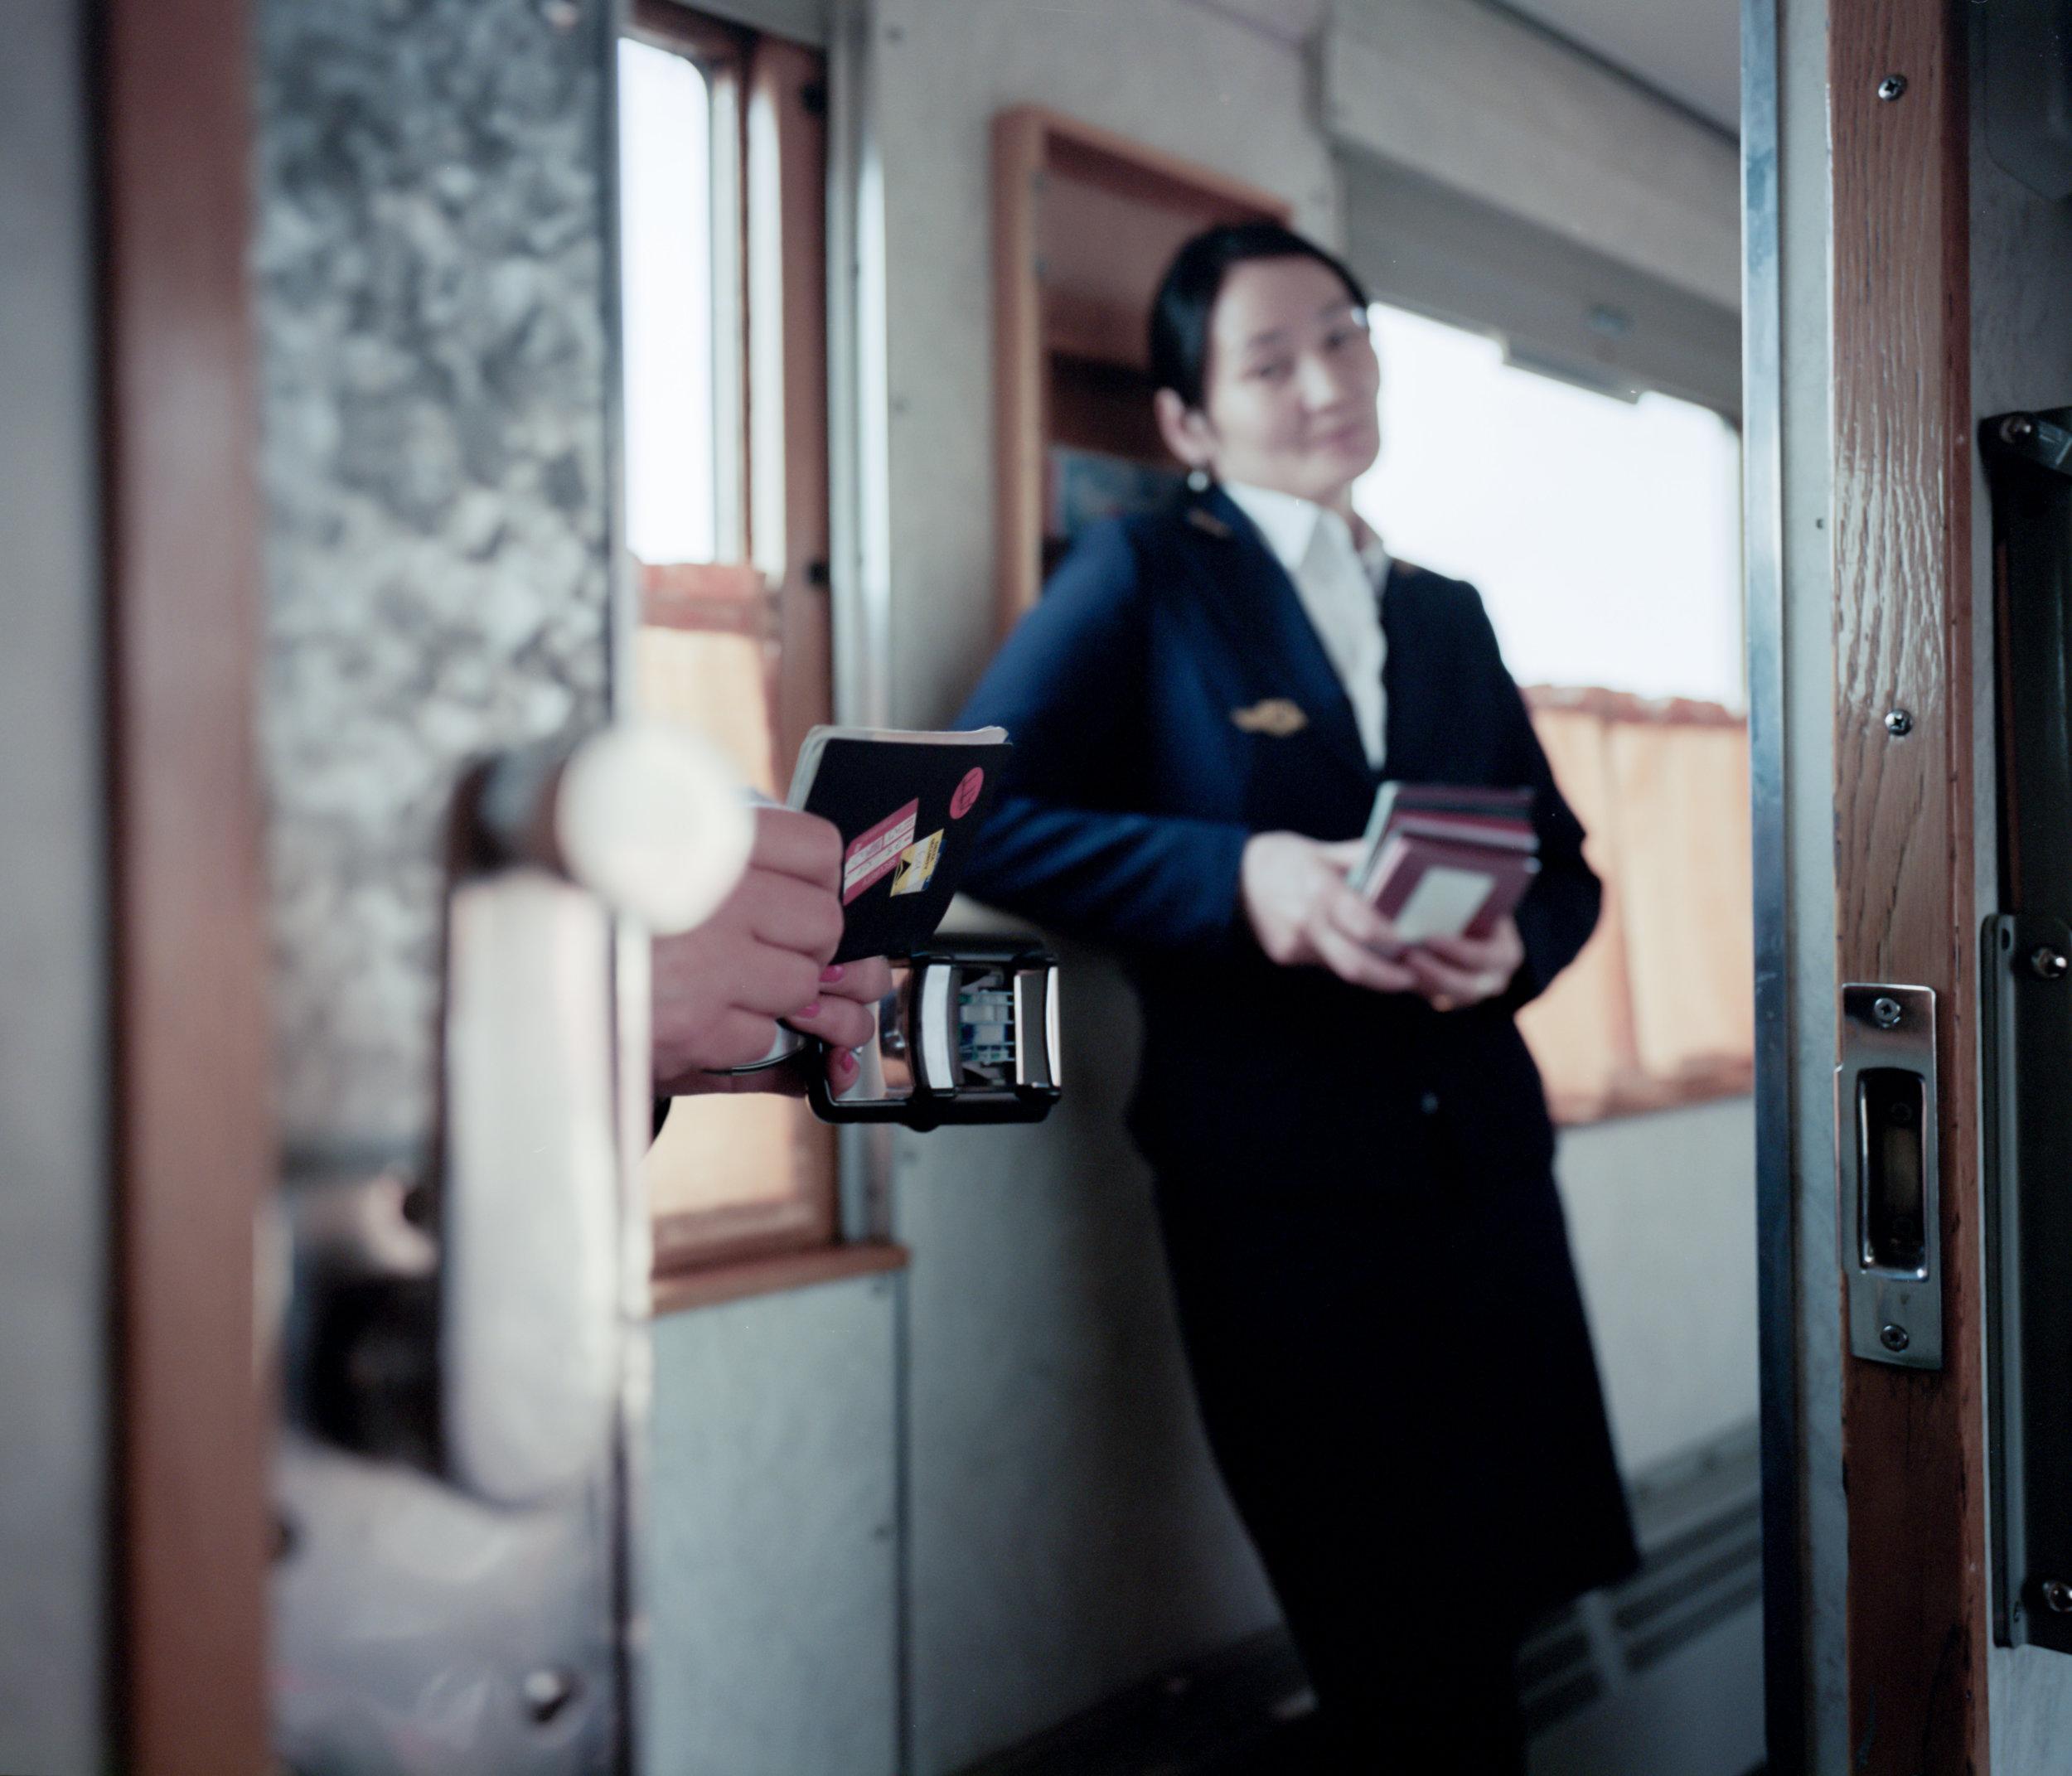 Border Check (this is my favorite photo from the trip) Fuji GF670w   Kodak Portra 400